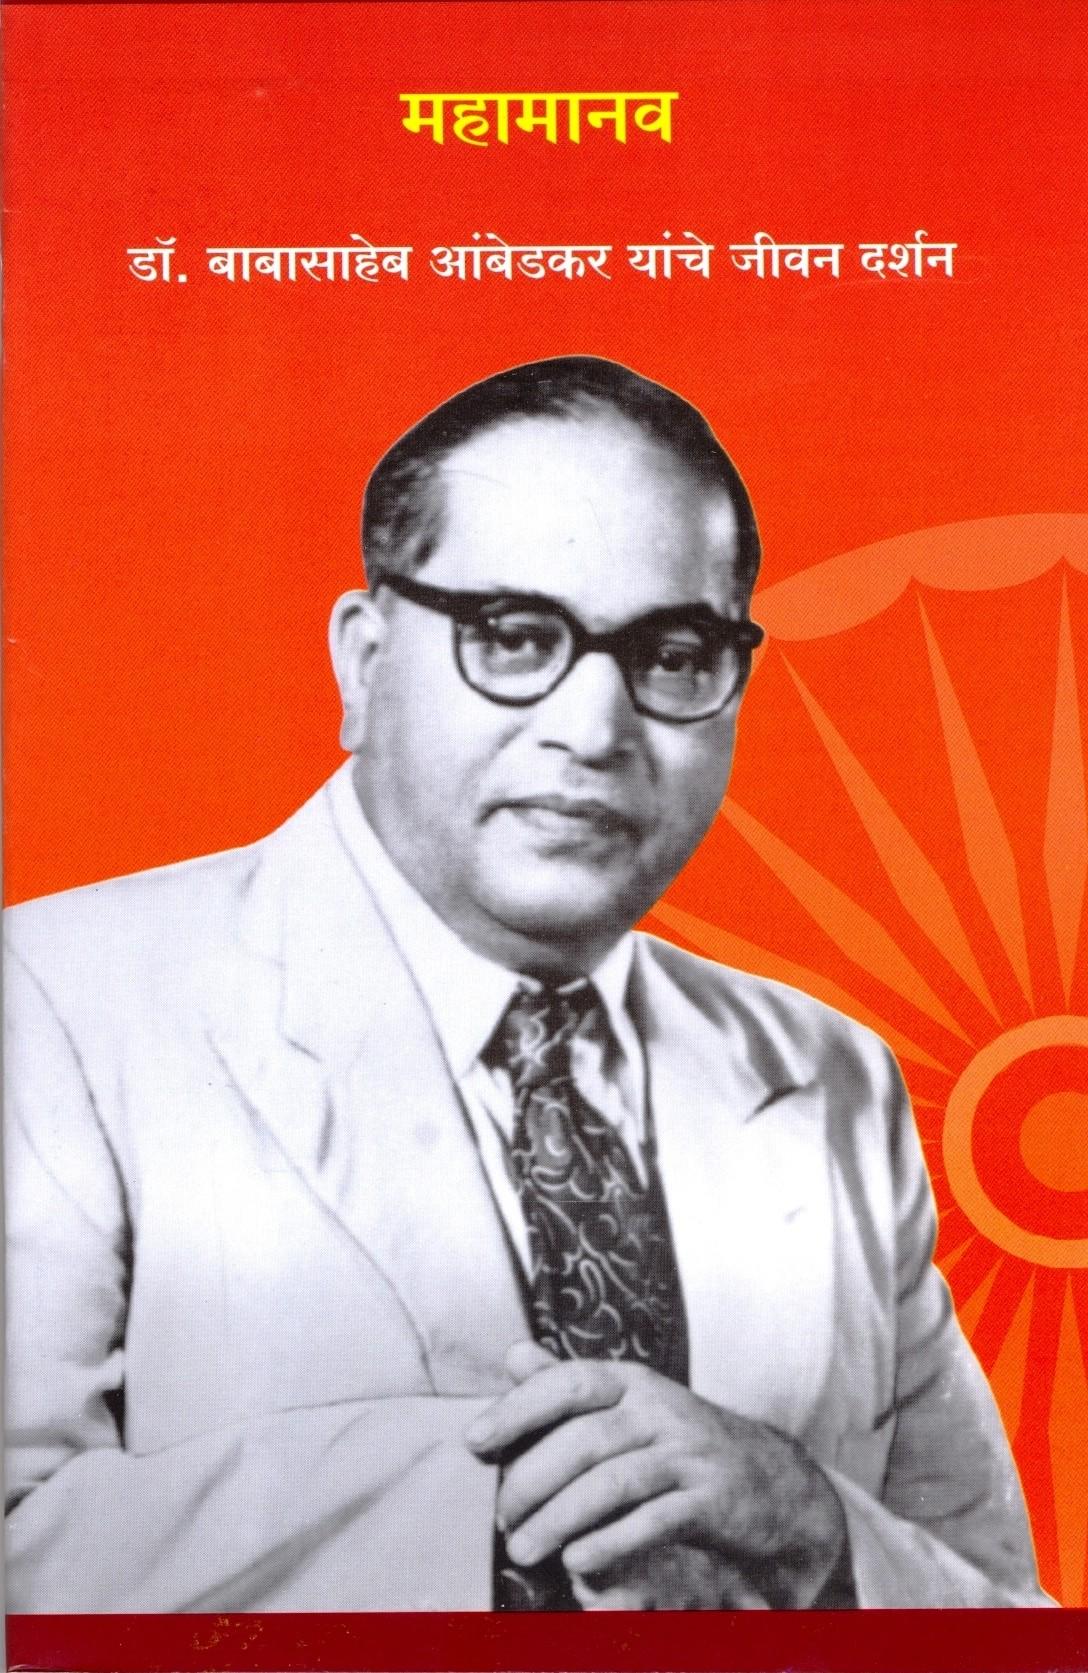 dr ambedkar life history